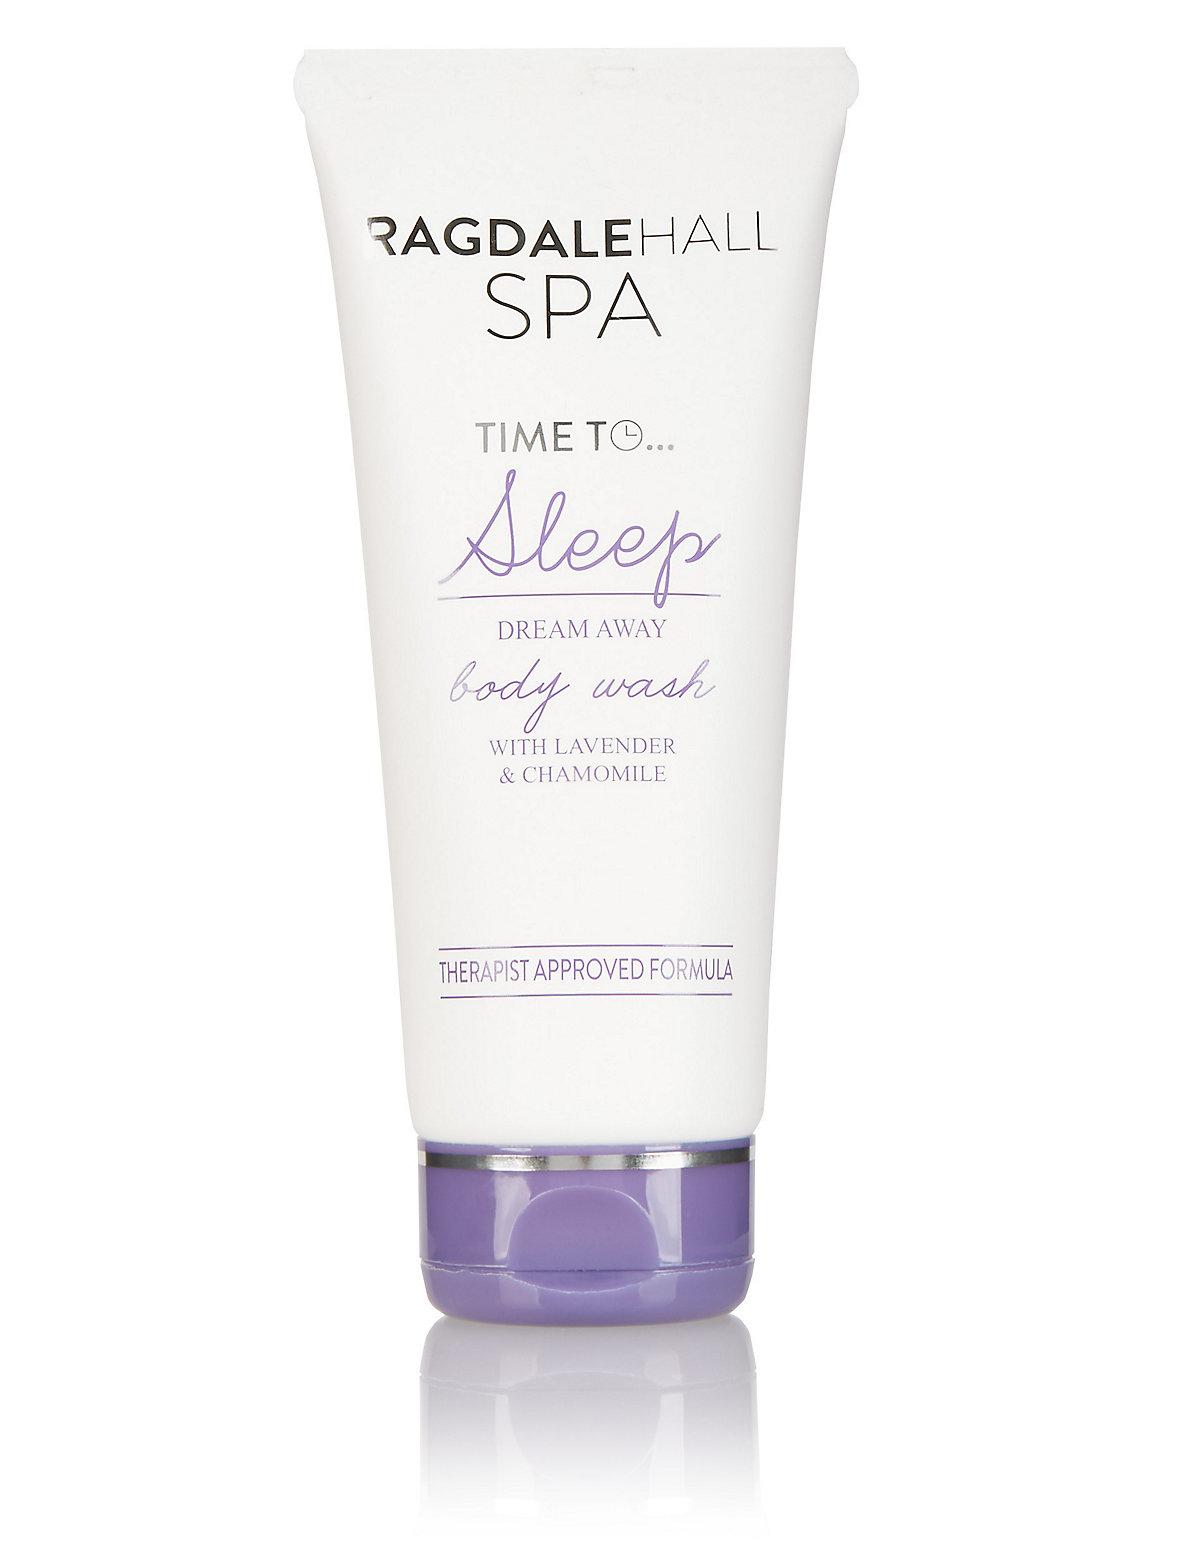 Ragdale Hall Sleep Body Wash 200ml